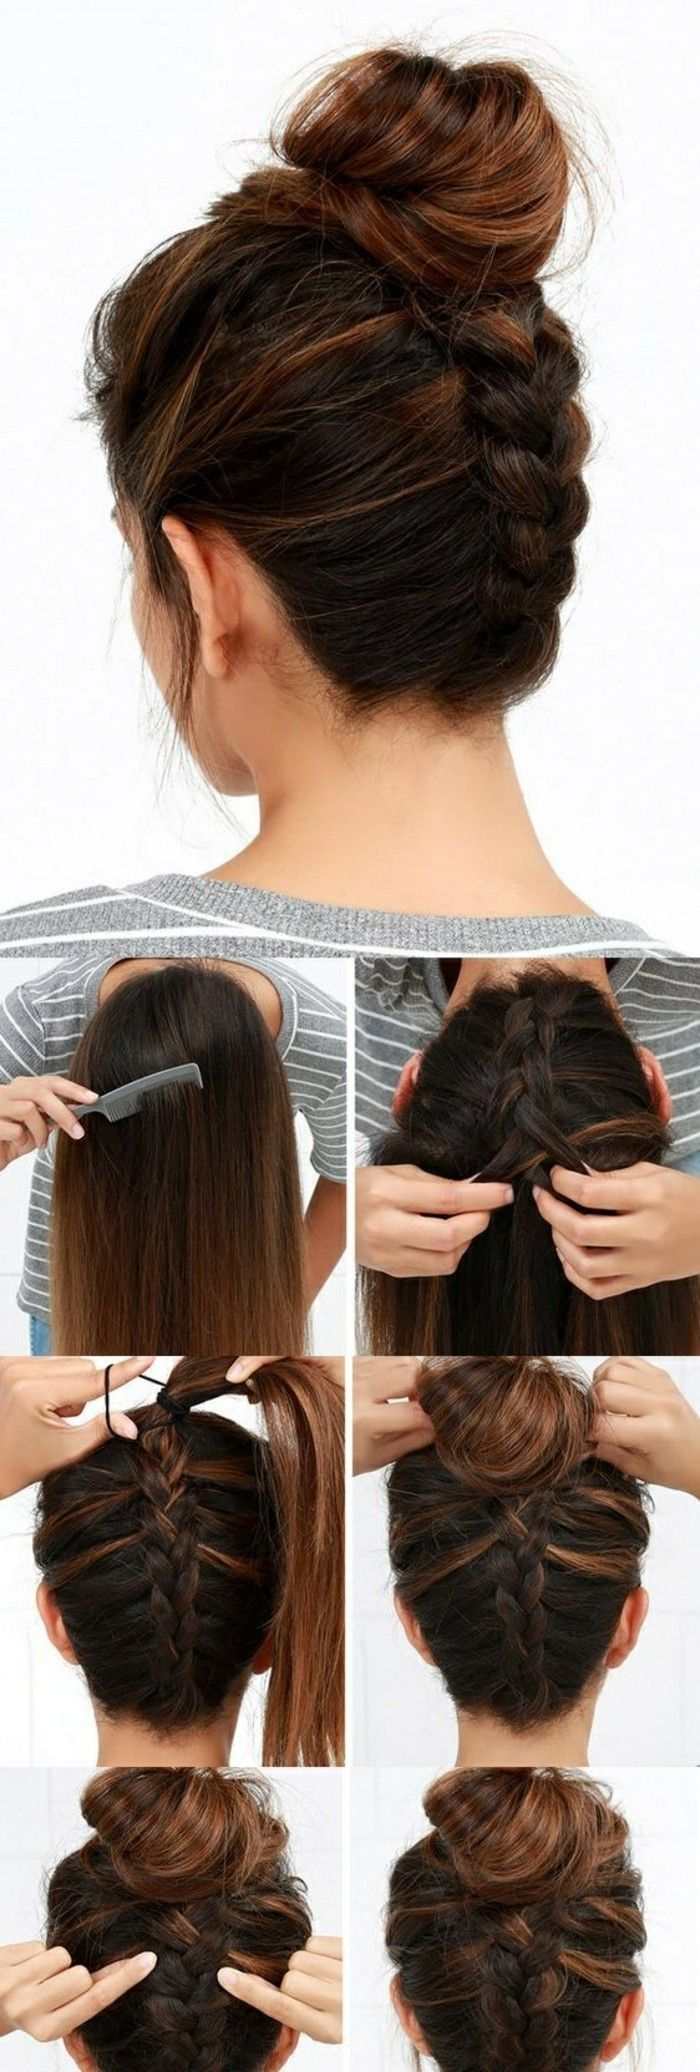 Id e tendance coupe coiffure femme 2017 2018 frisuren hair pinterest coiffure - Pinterest coiffure femme ...